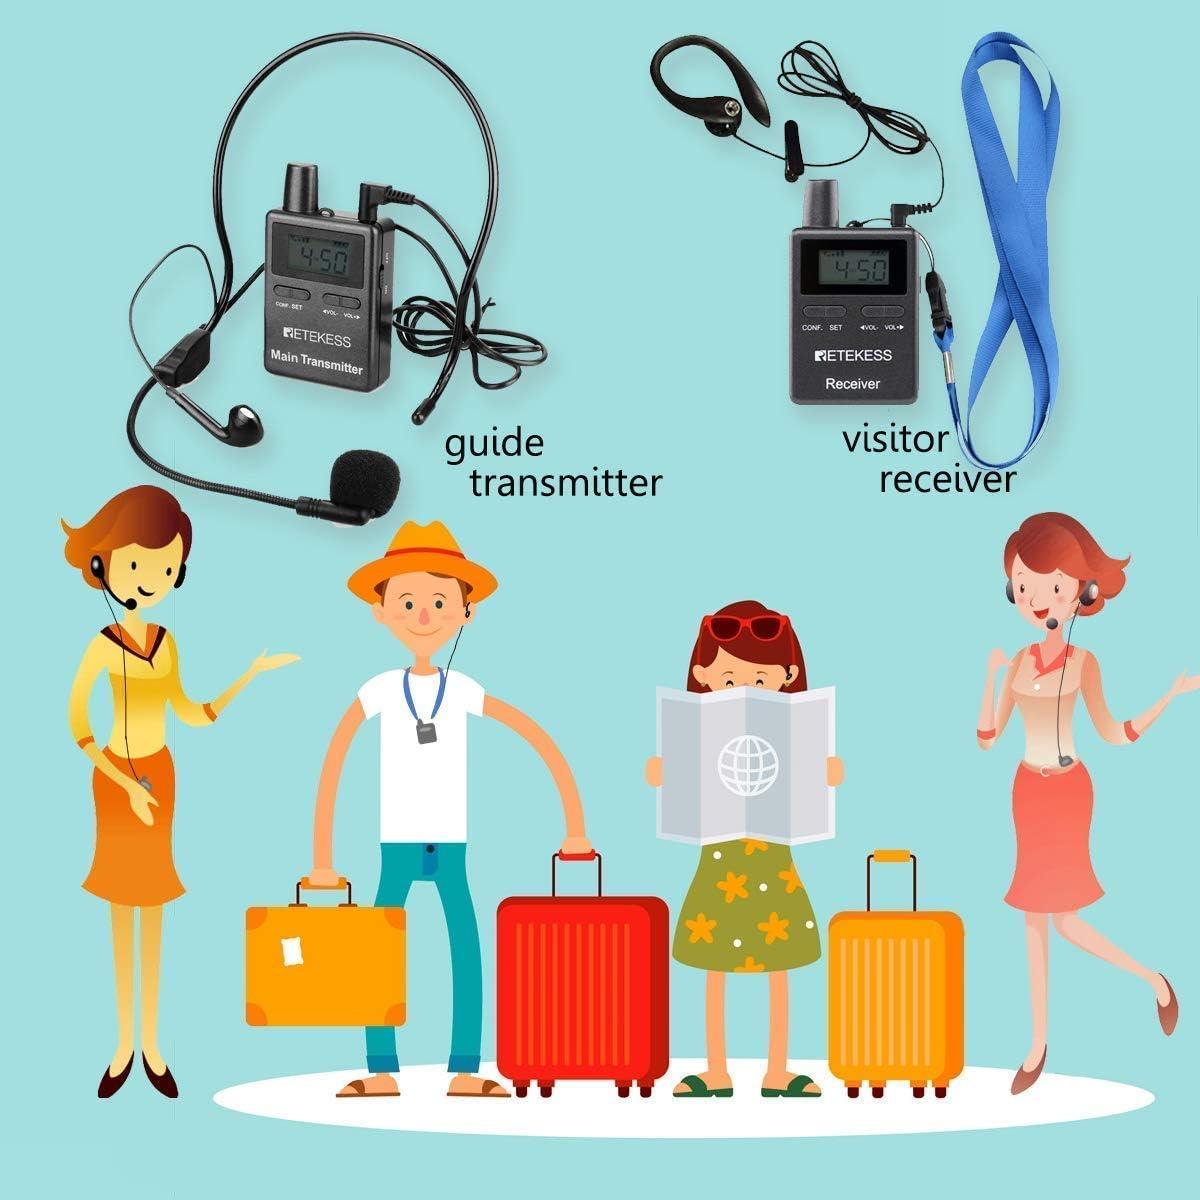 2 Pack Retekess TT105 Wireless Transmitter for Tour Guide System 1500mAh Battery 50 Channels for Traveling Museum Visit Conference